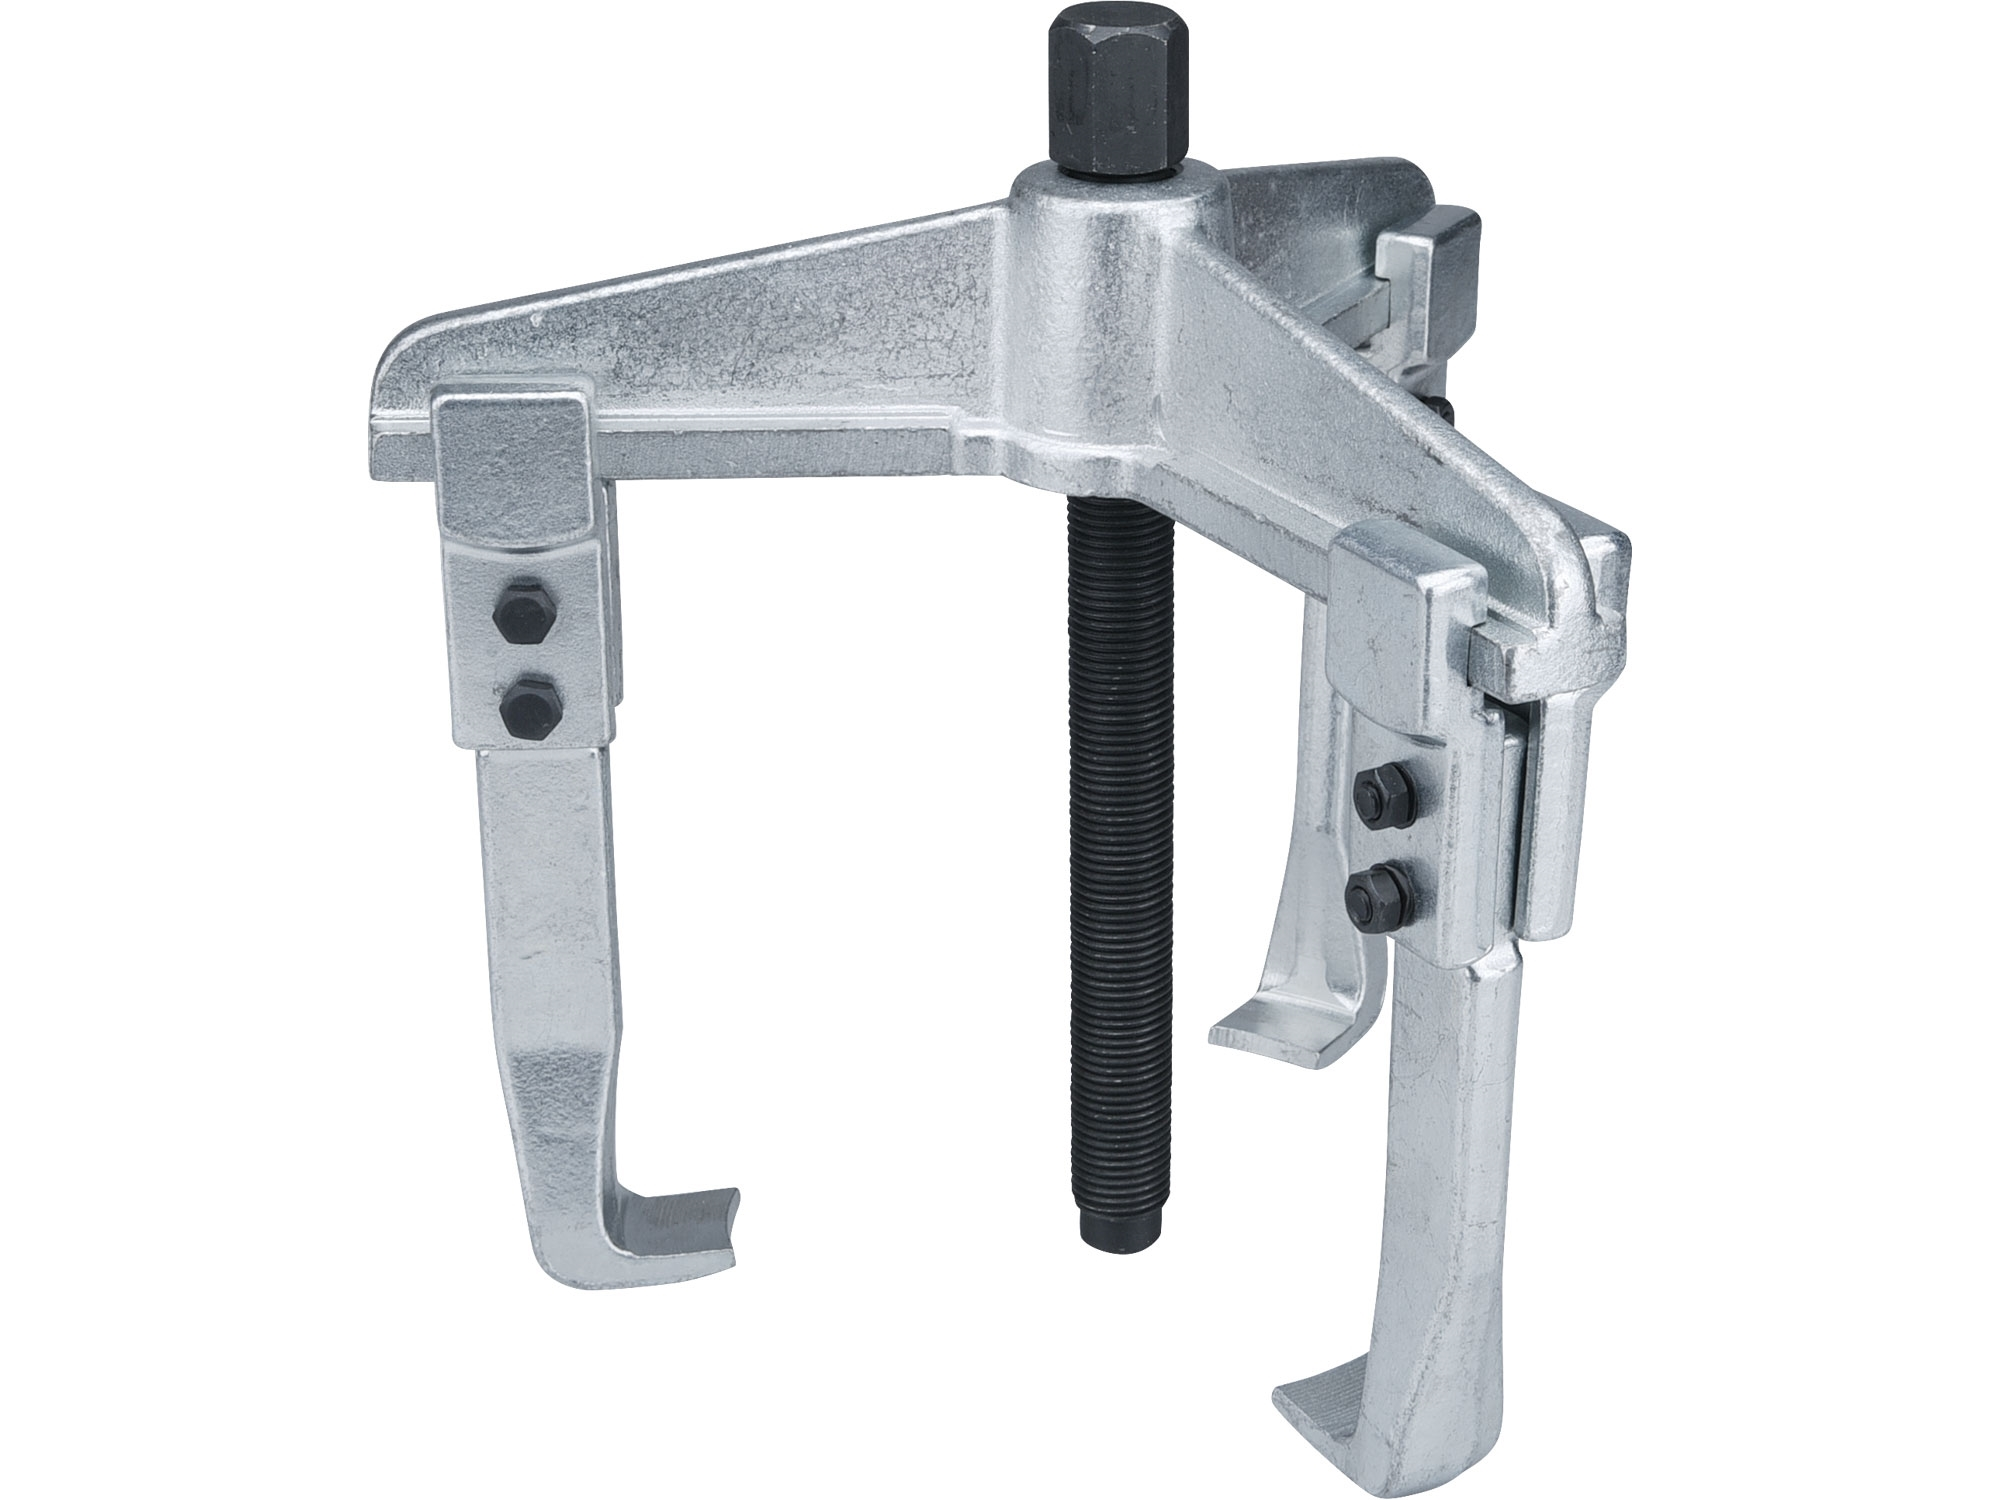 stahovák tříramenný, kovaný, rozpětí 200, hloubka 150mm, EXTOL PREMIUM 8816732